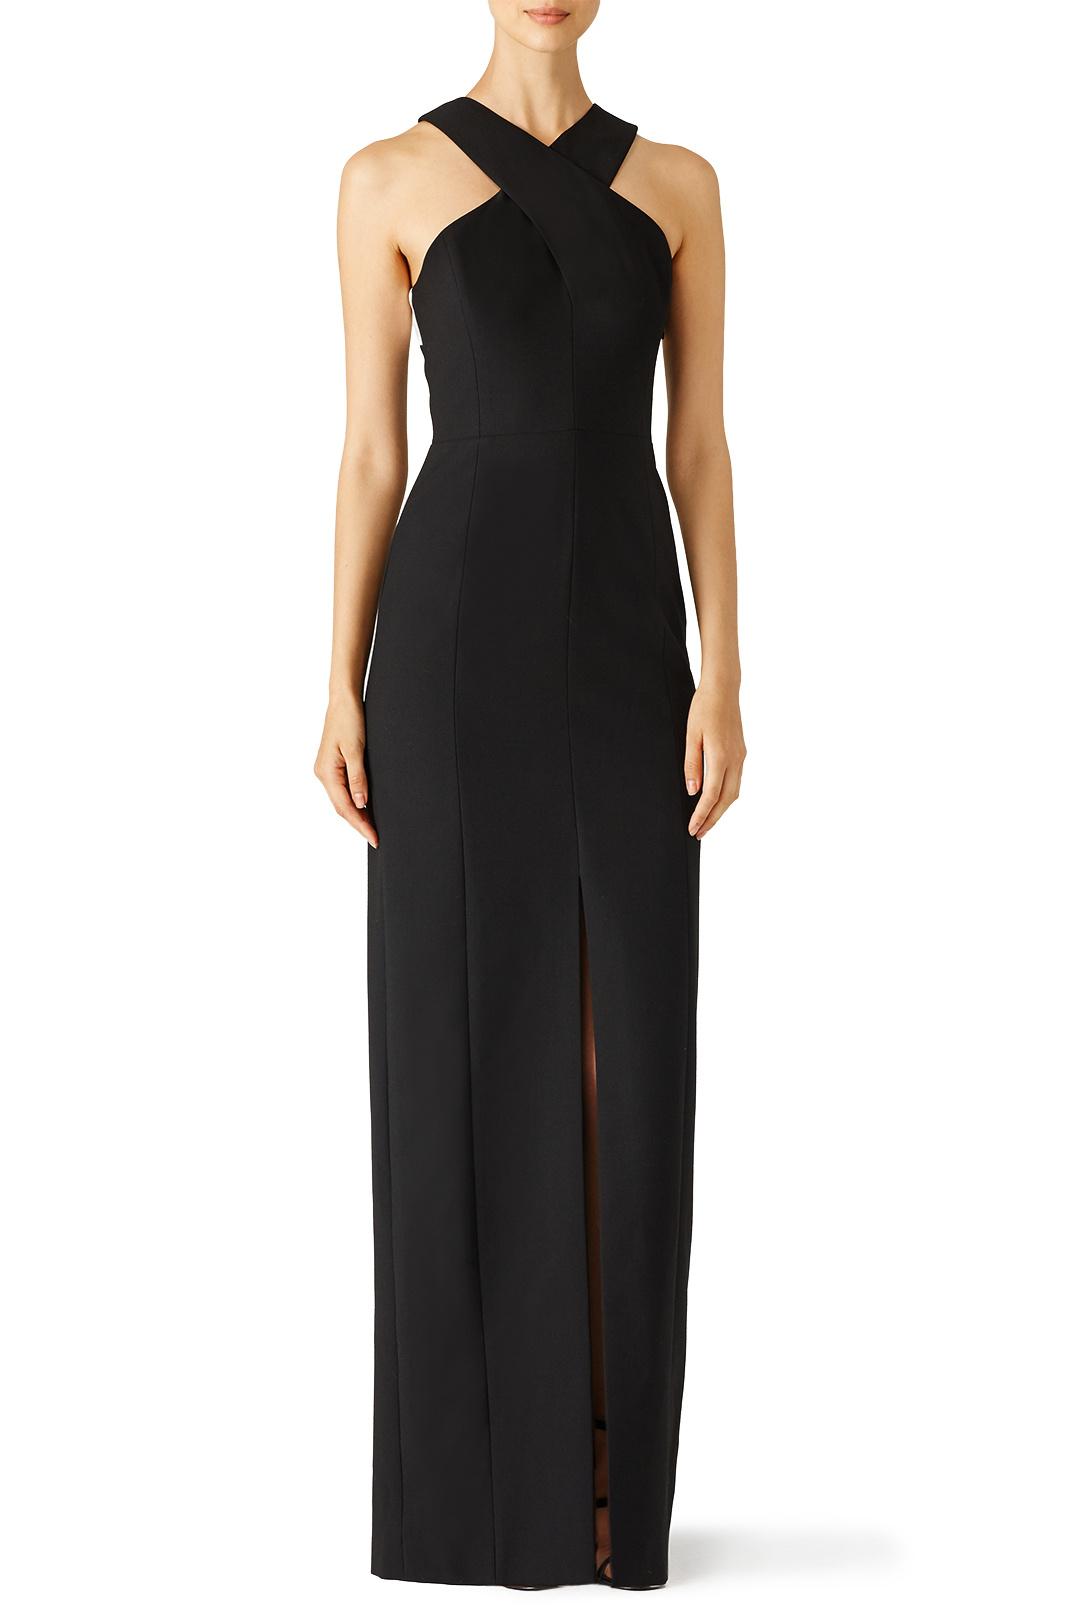 Elizabeth & James Black Mila Gown